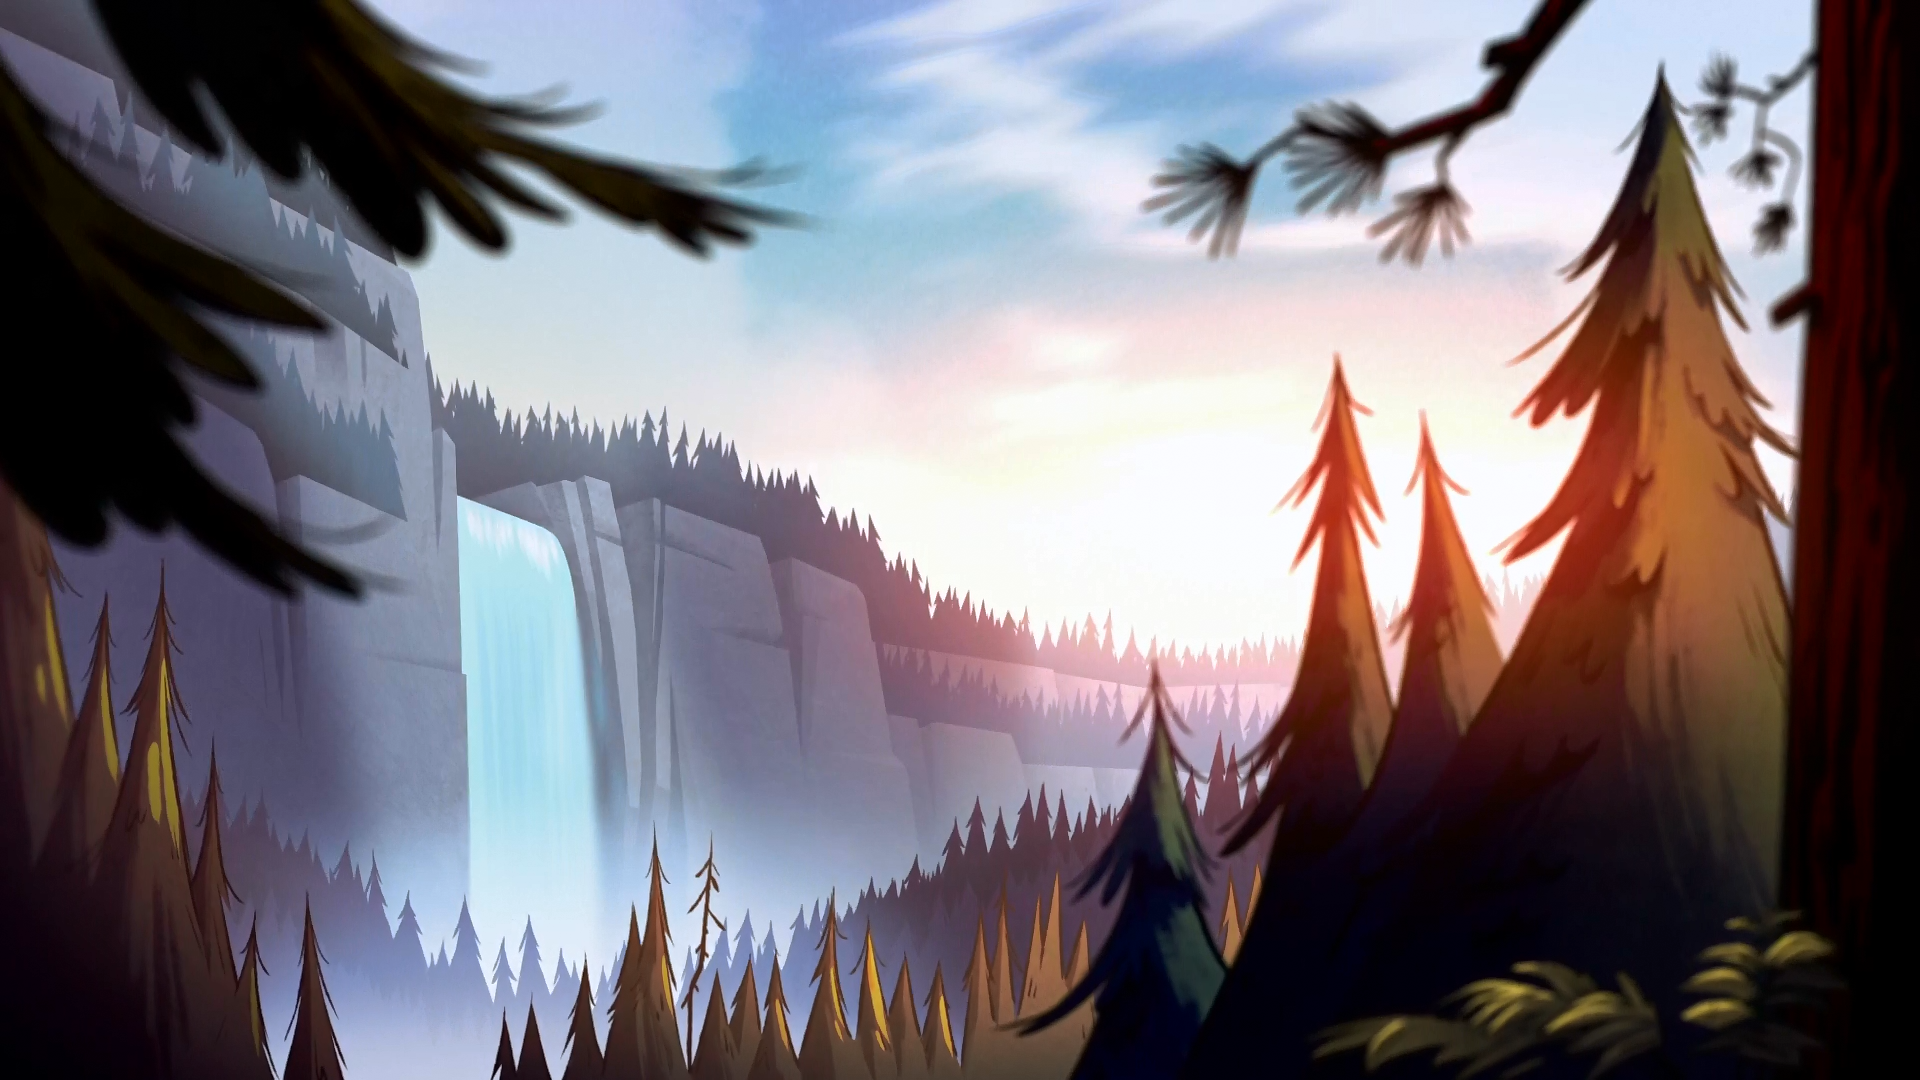 Google gravity theme - Theme Song Gravity Falls Backgrounds Google Search